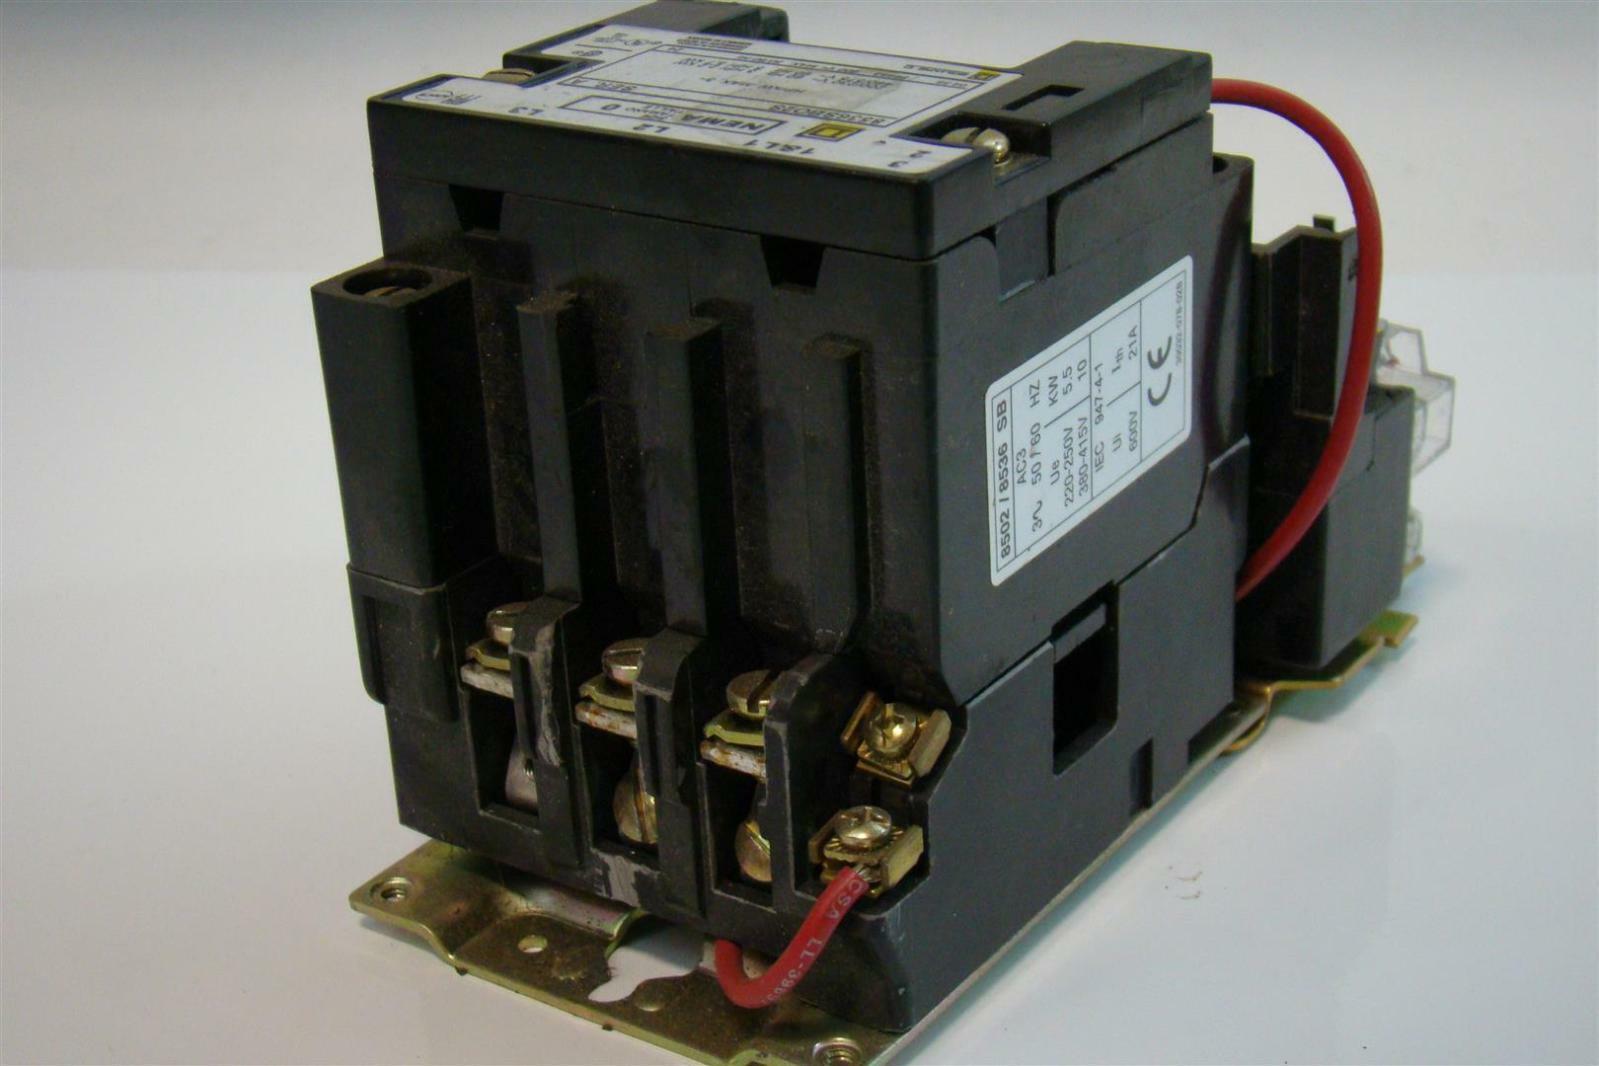 square d 8536 motor starter wiring diagram telephone line uk size 3 5hp 8502 sb 608536sbo2s